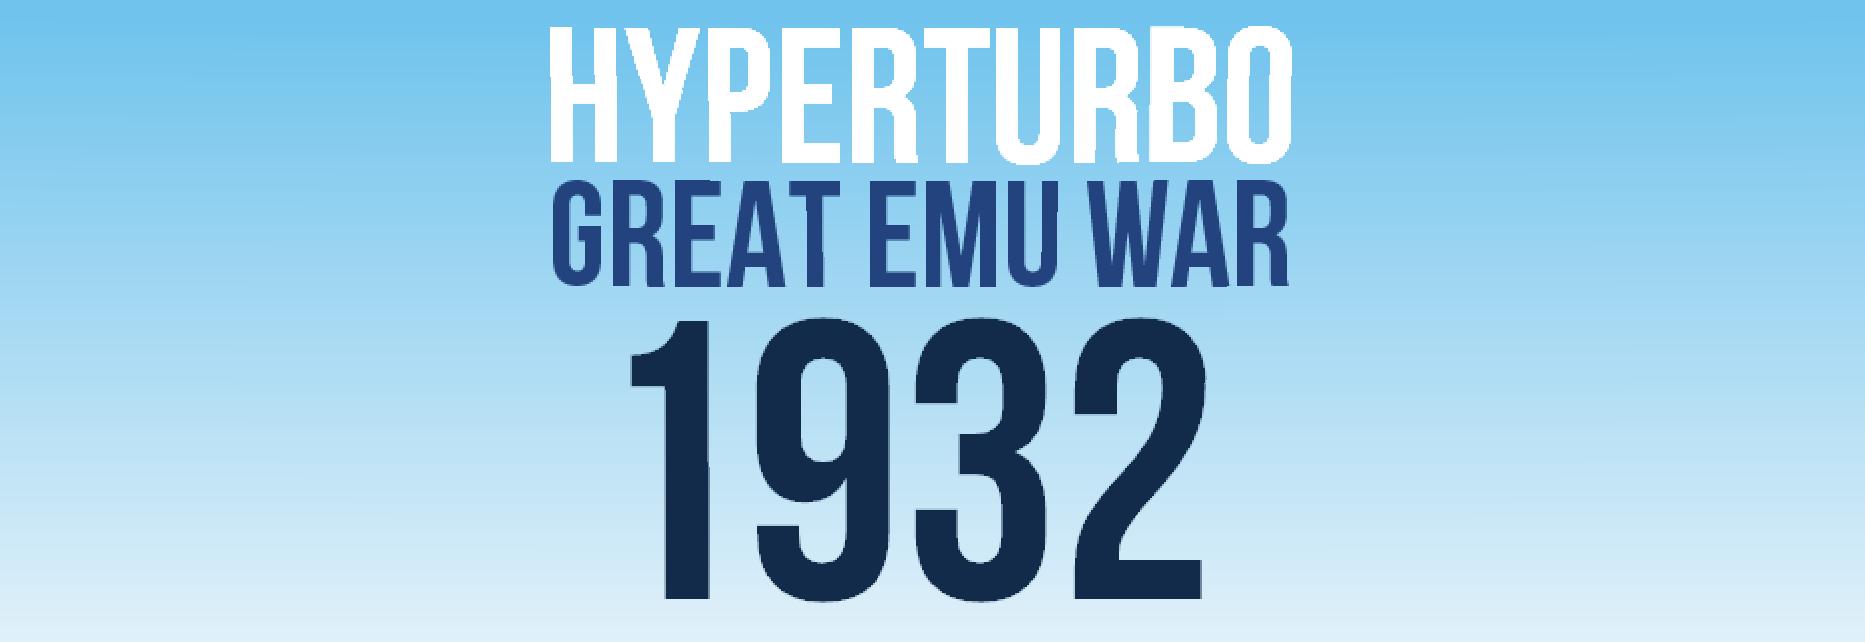 Hyperturbo Great Emu War 1932